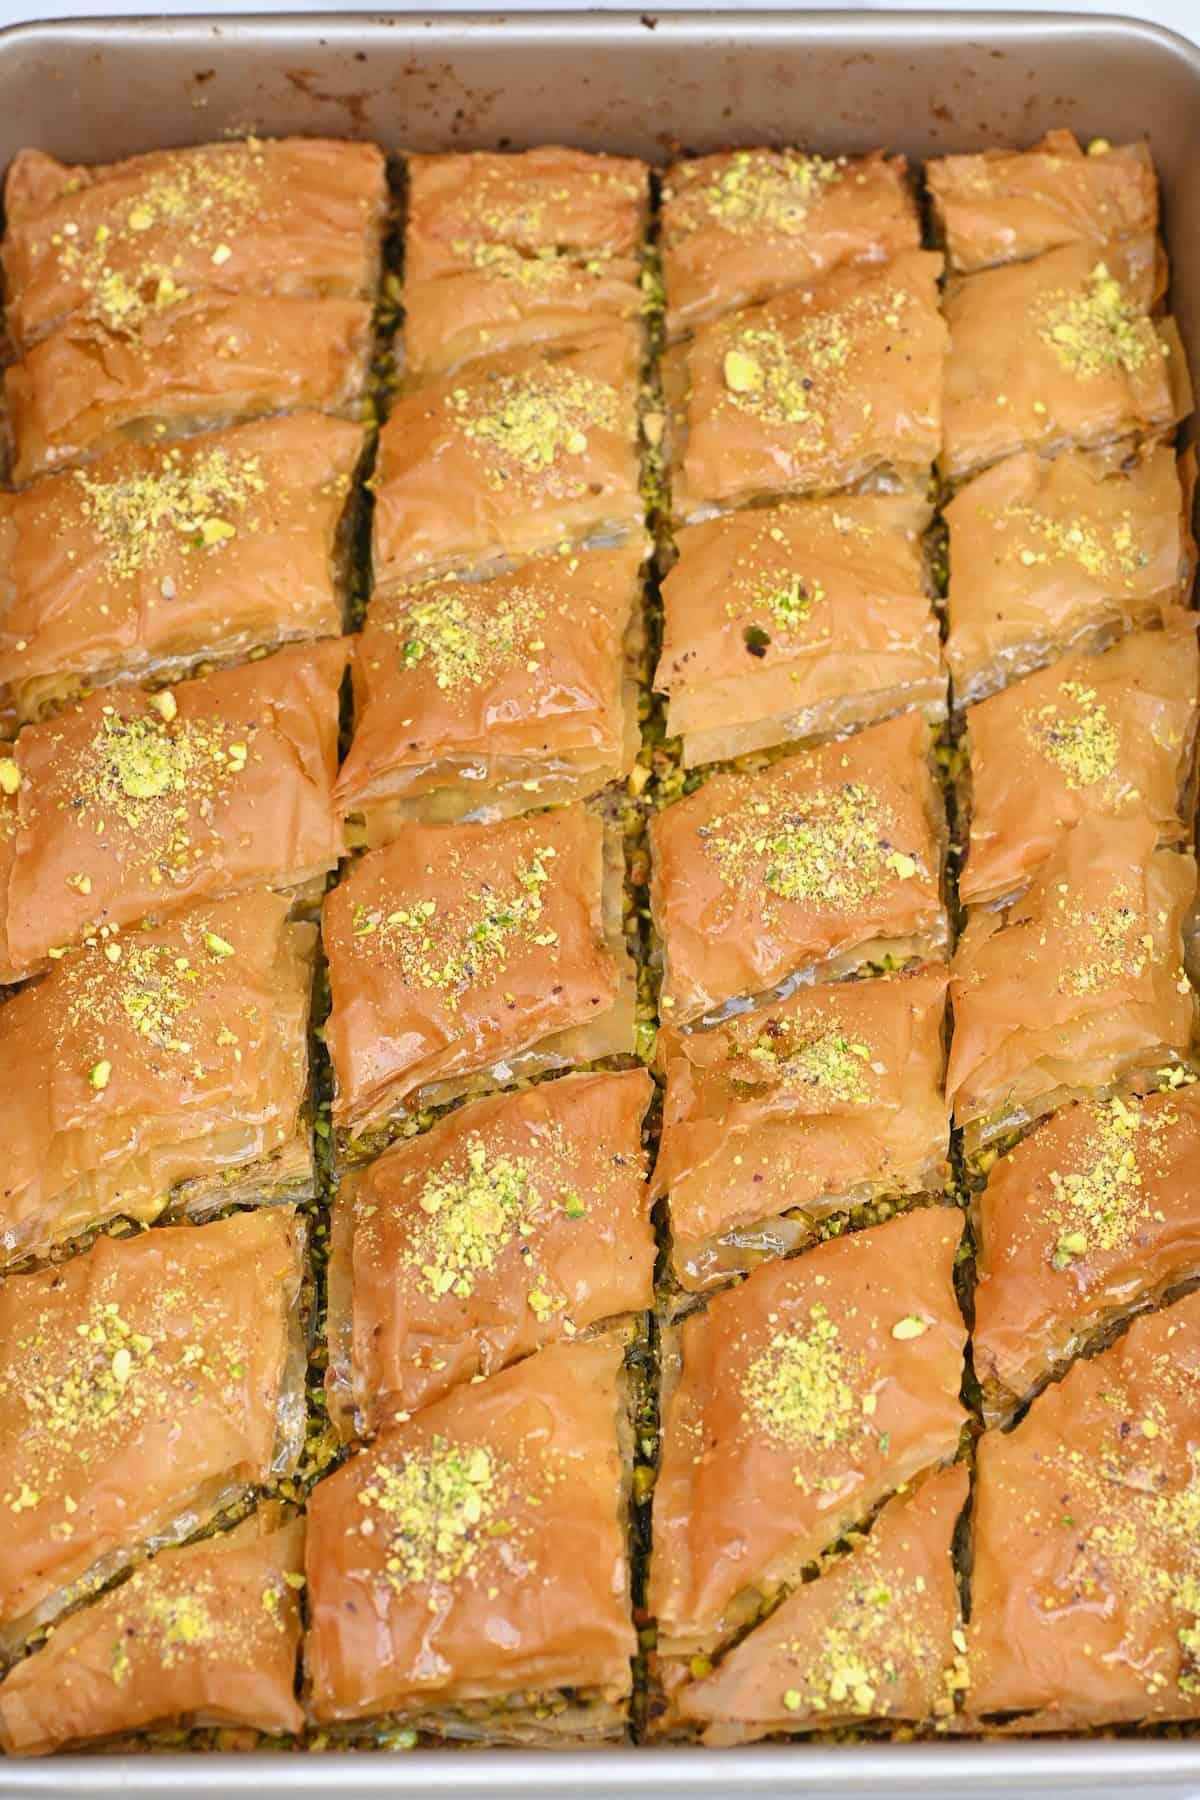 Freshly baked baklava in a pan